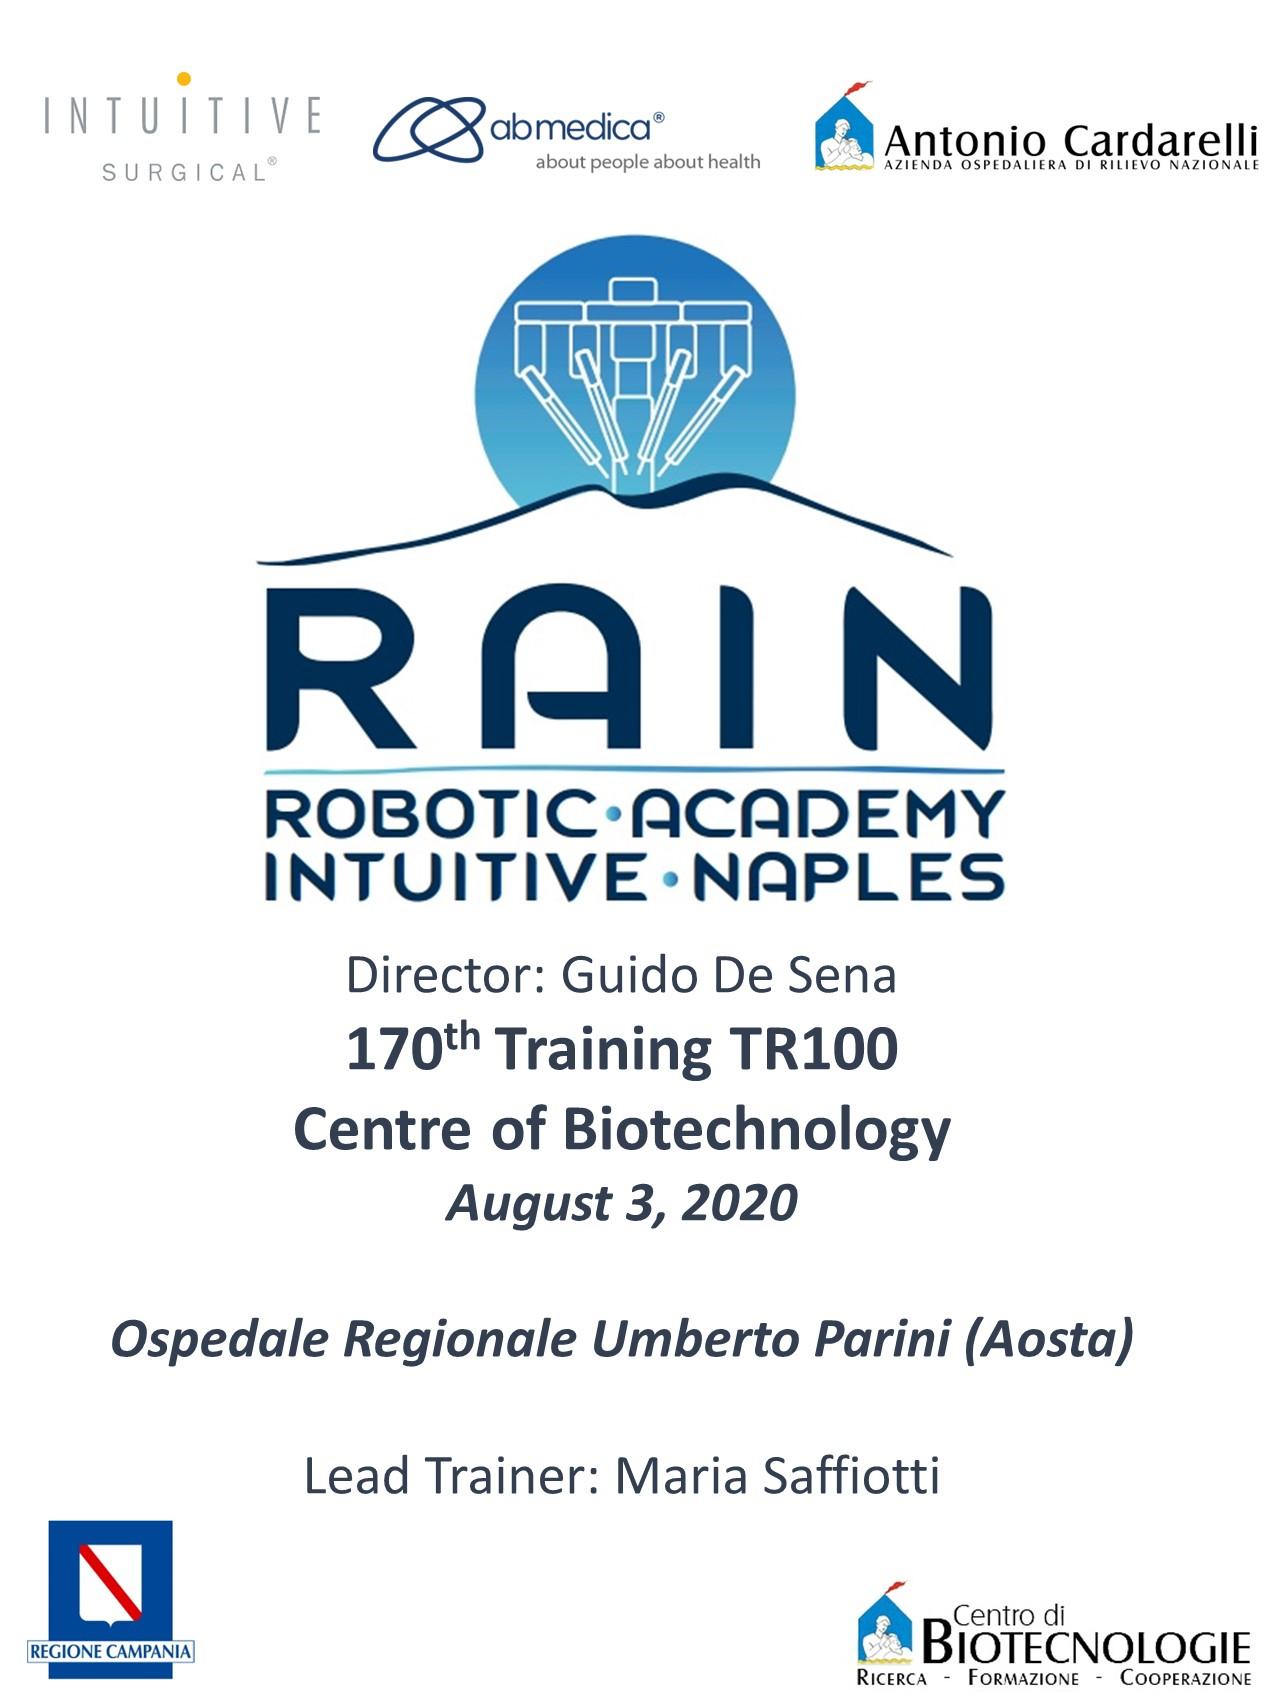 RAIN - Robotic Academy Intuitive Naples - 170th Training TR100